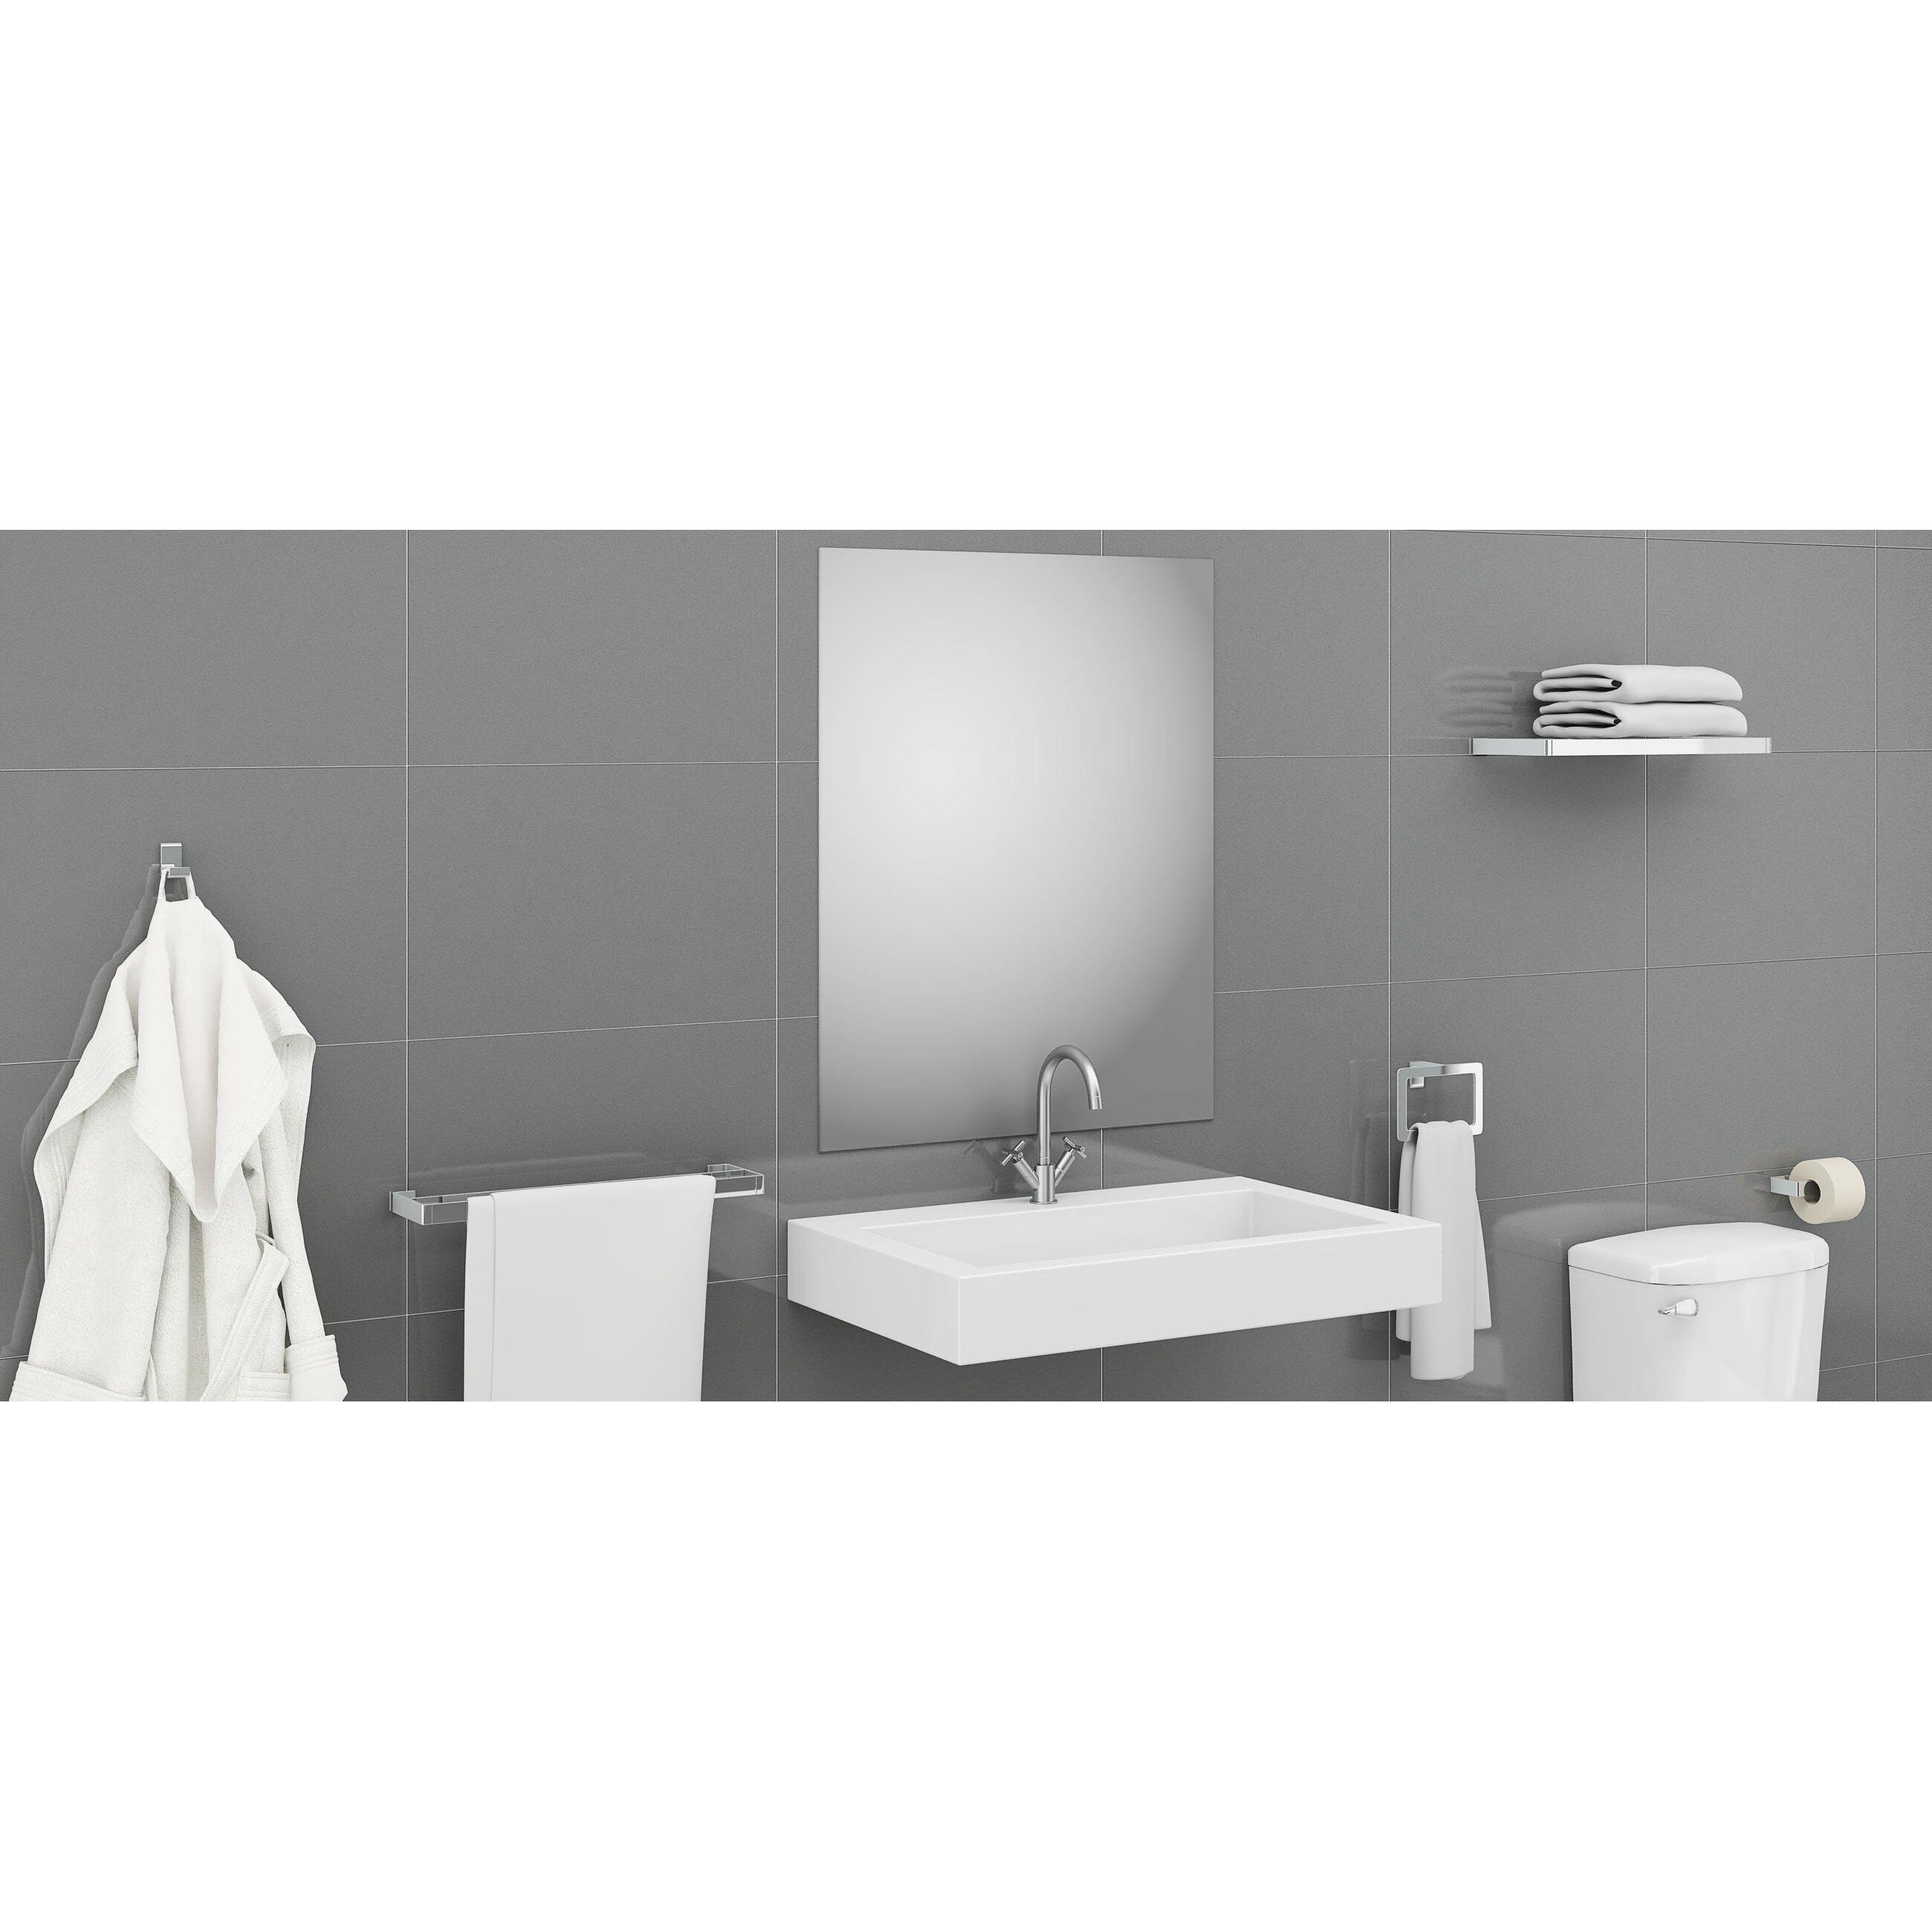 Ancona gala 4 piece bathroom hardware set wayfair for Bathroom 4 piece set